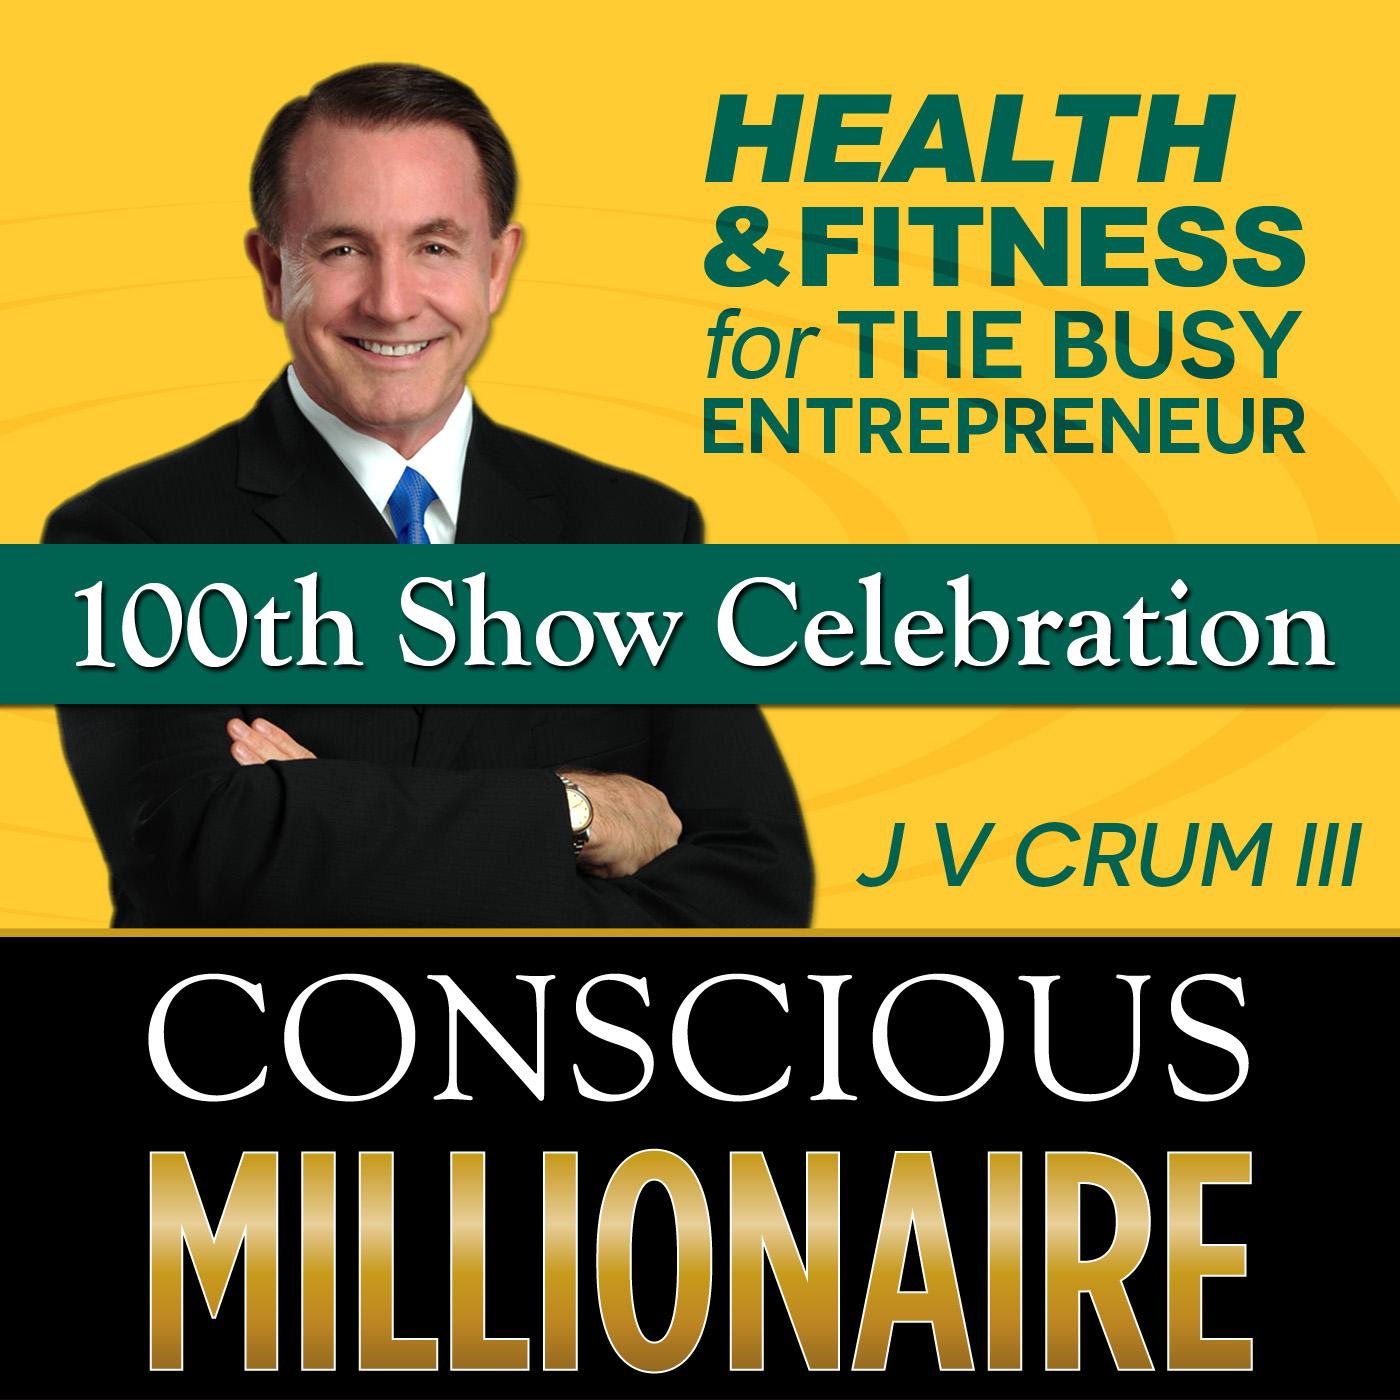 Conscious Millionaire Health